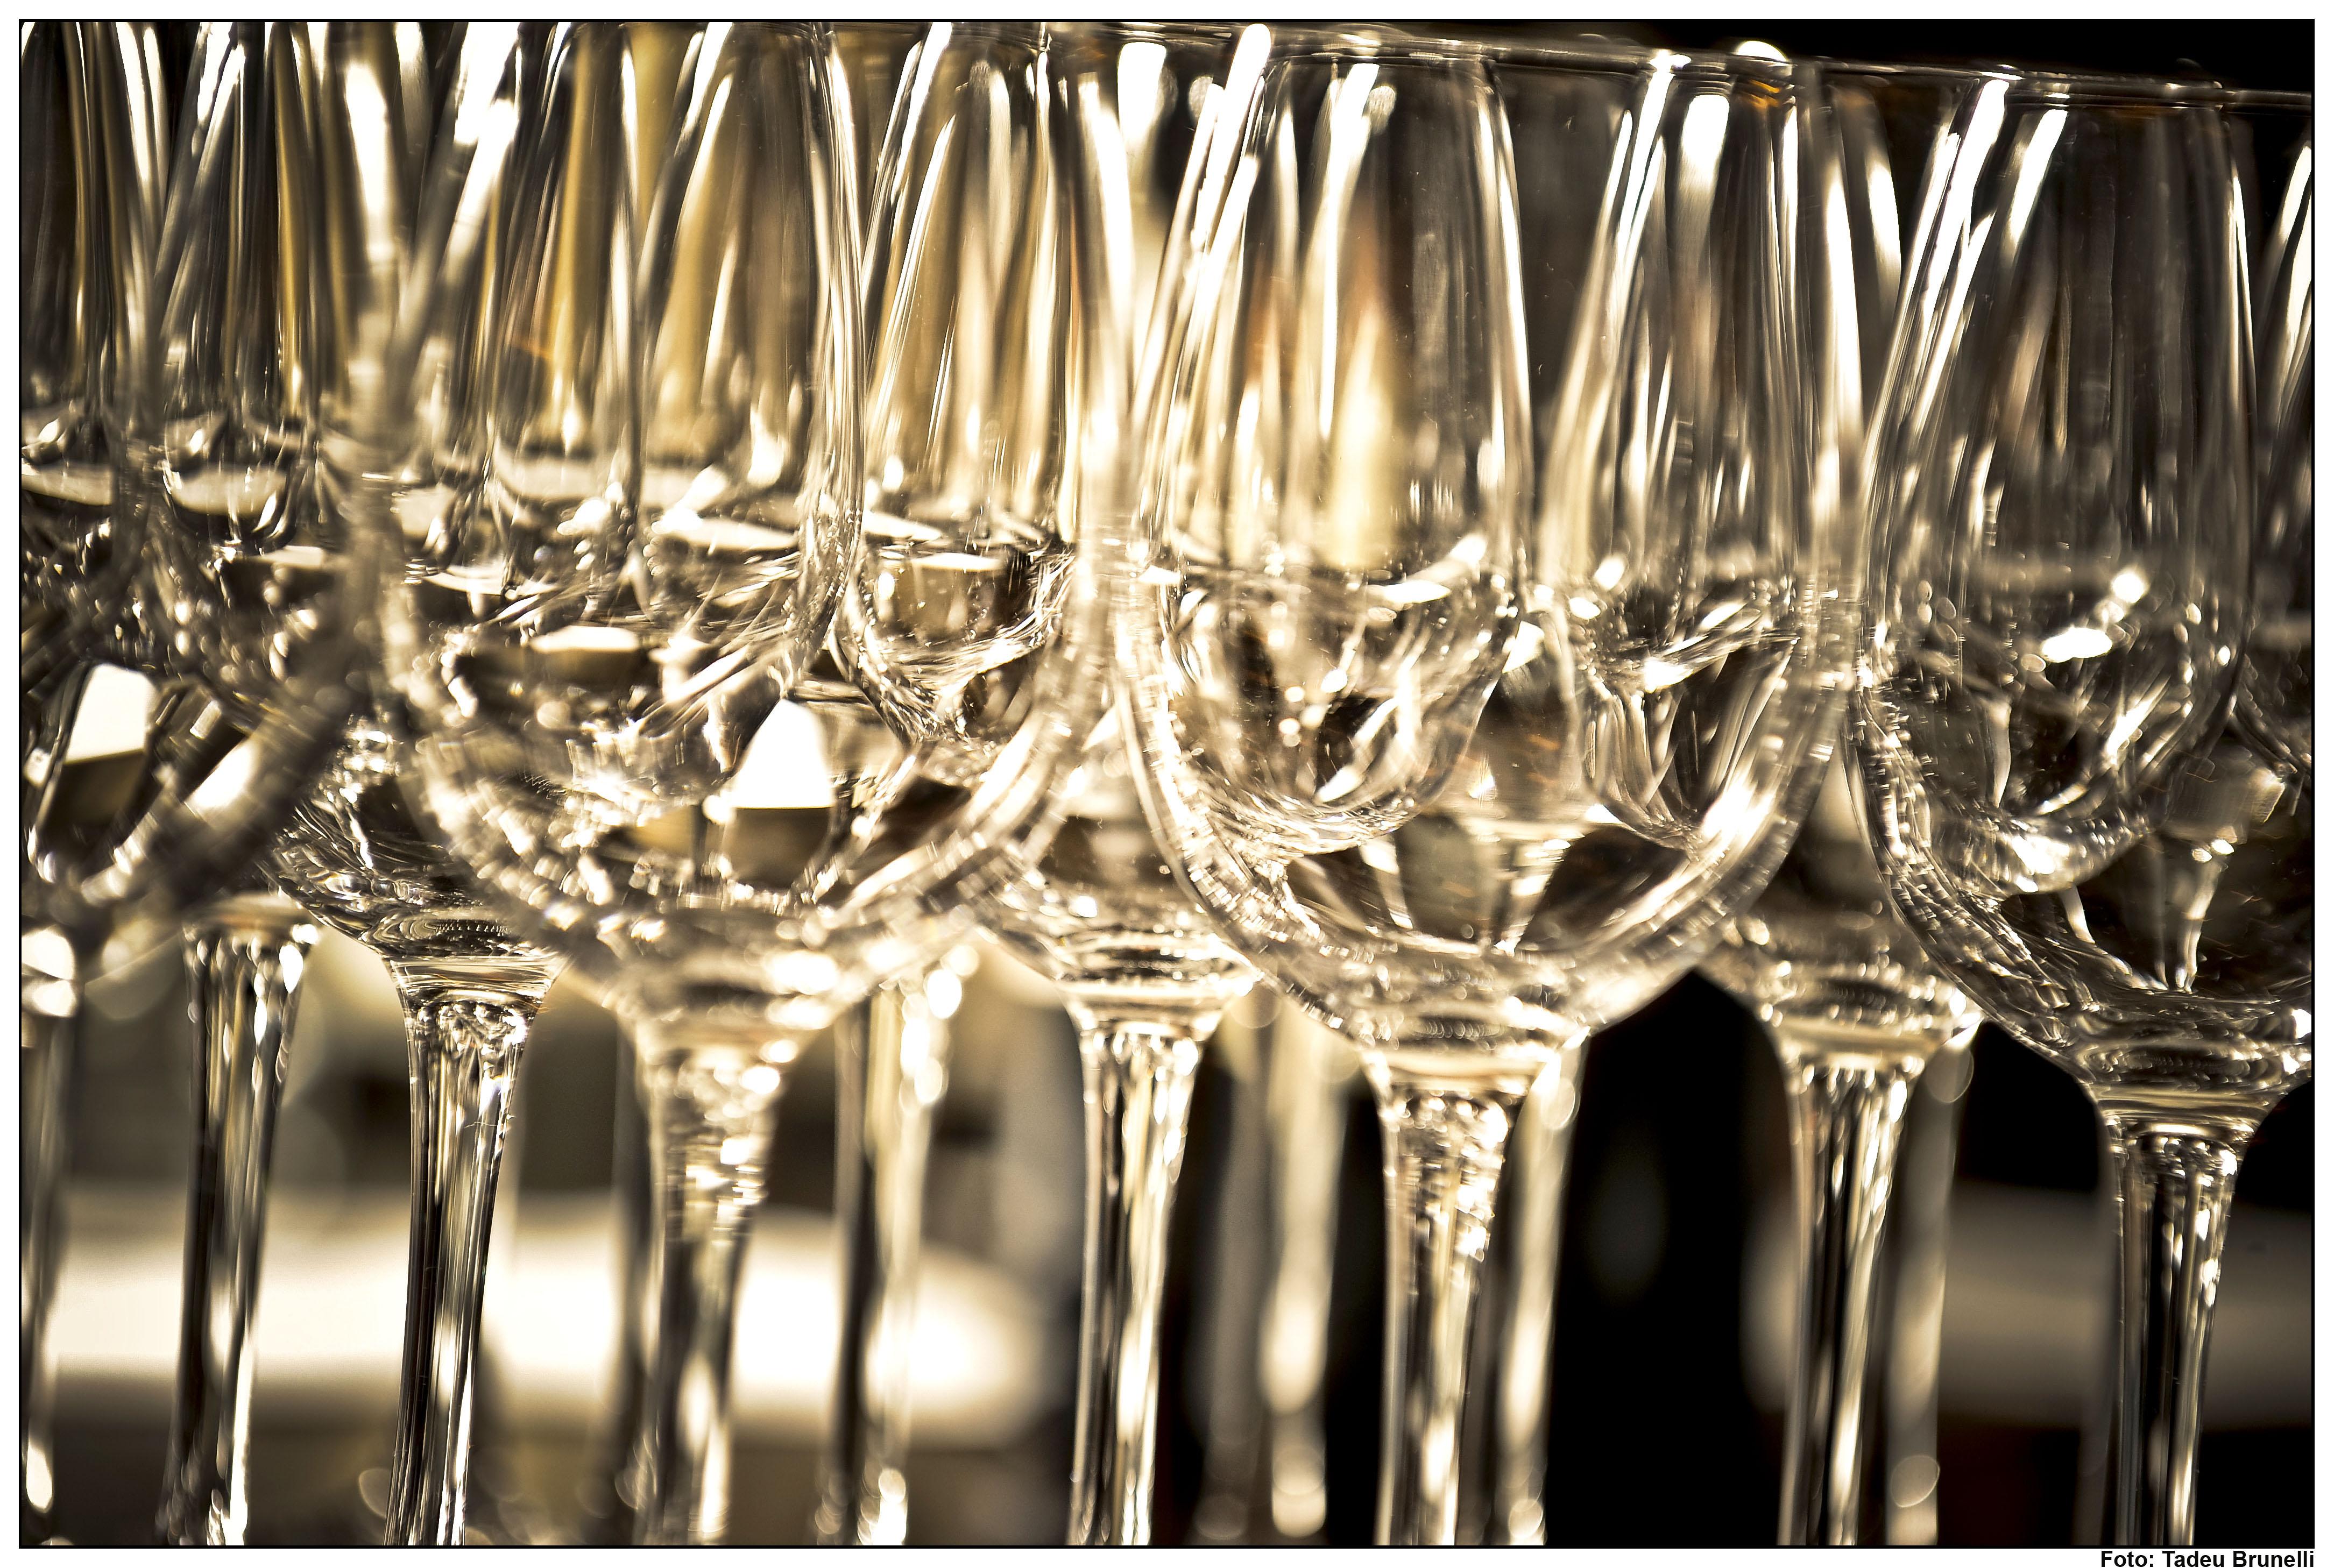 Hyatt Wine Club | Vinhos da Argentina – IV